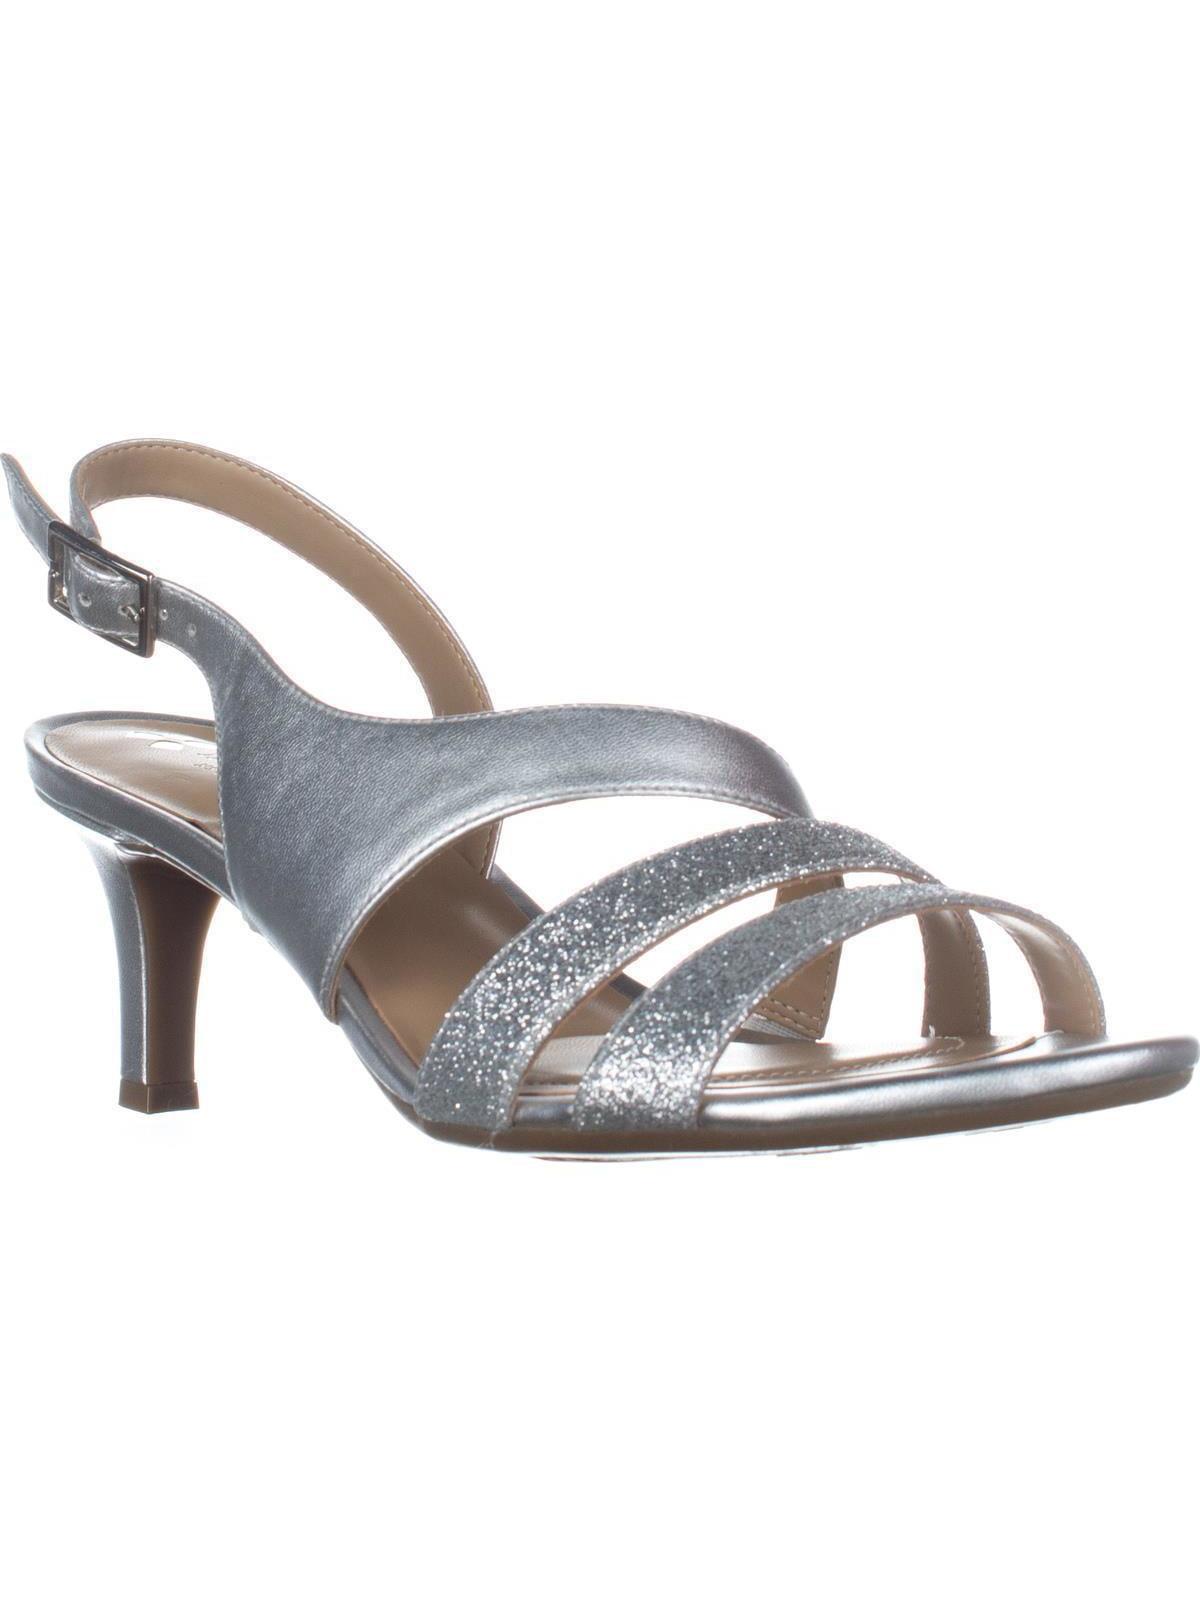 57137566196b Naturalizer Womens Tami Open Toe Casual Slingback Sandals